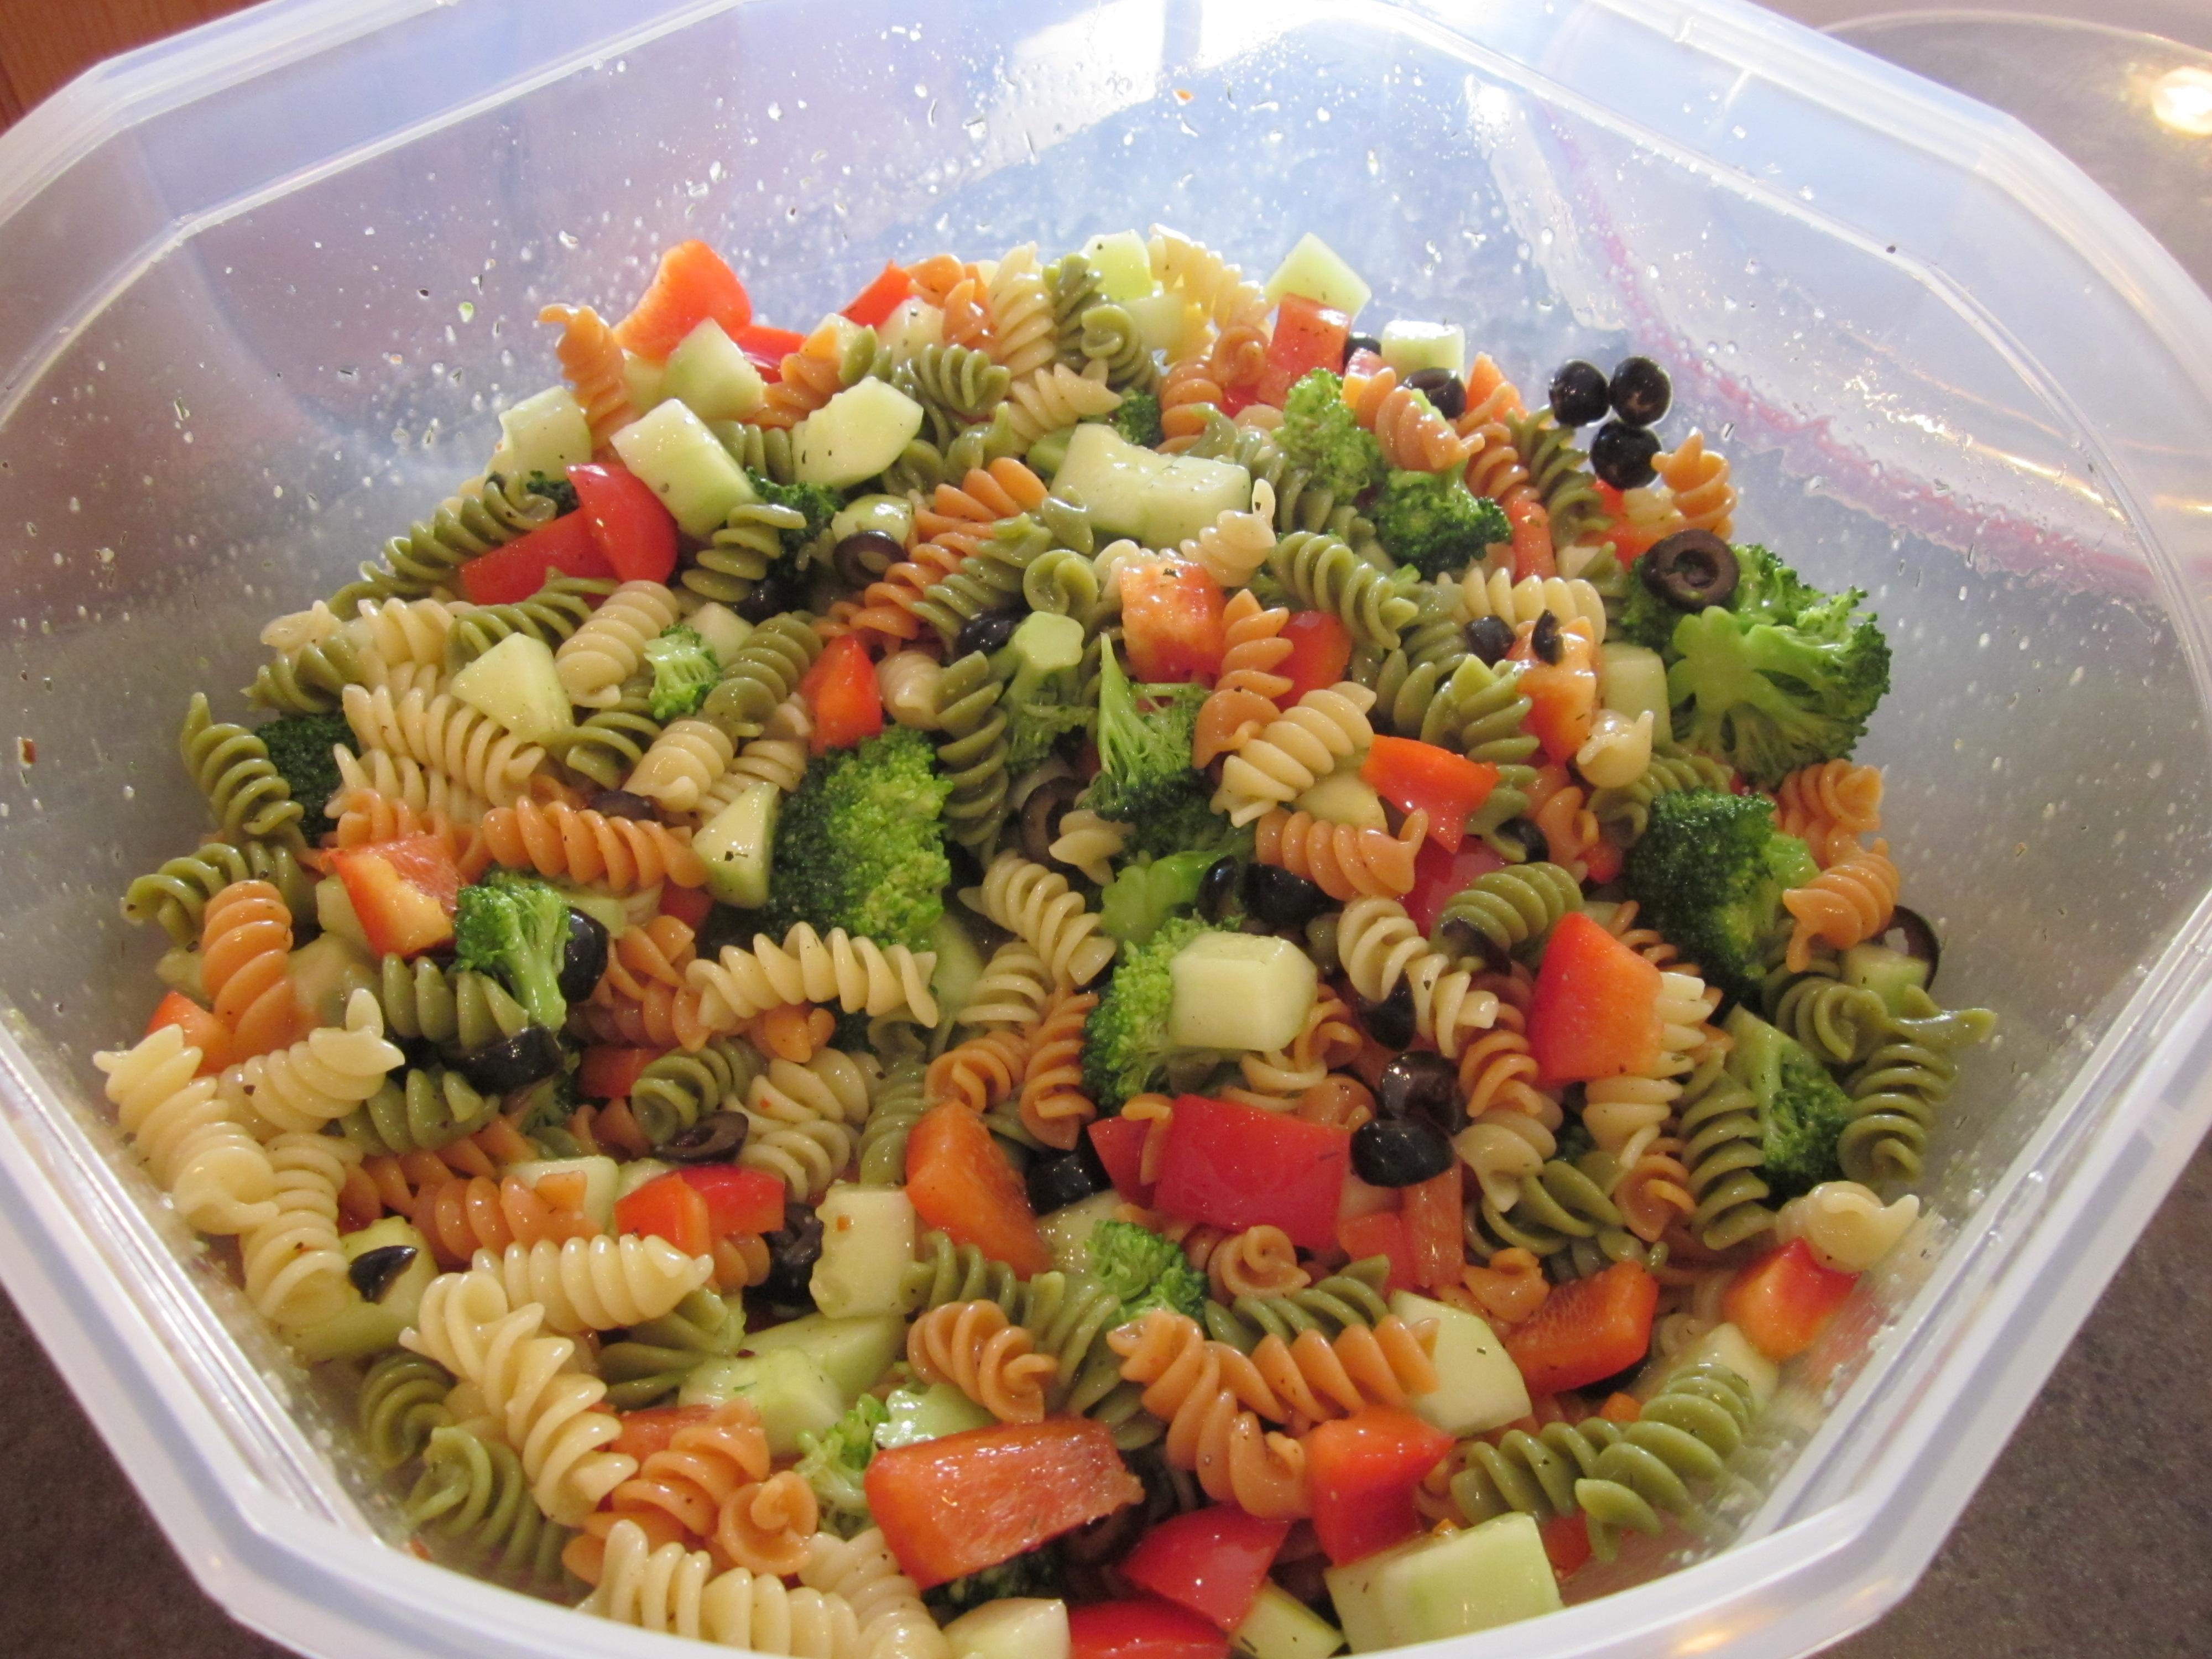 Classic Pasta Salad Recipes Images